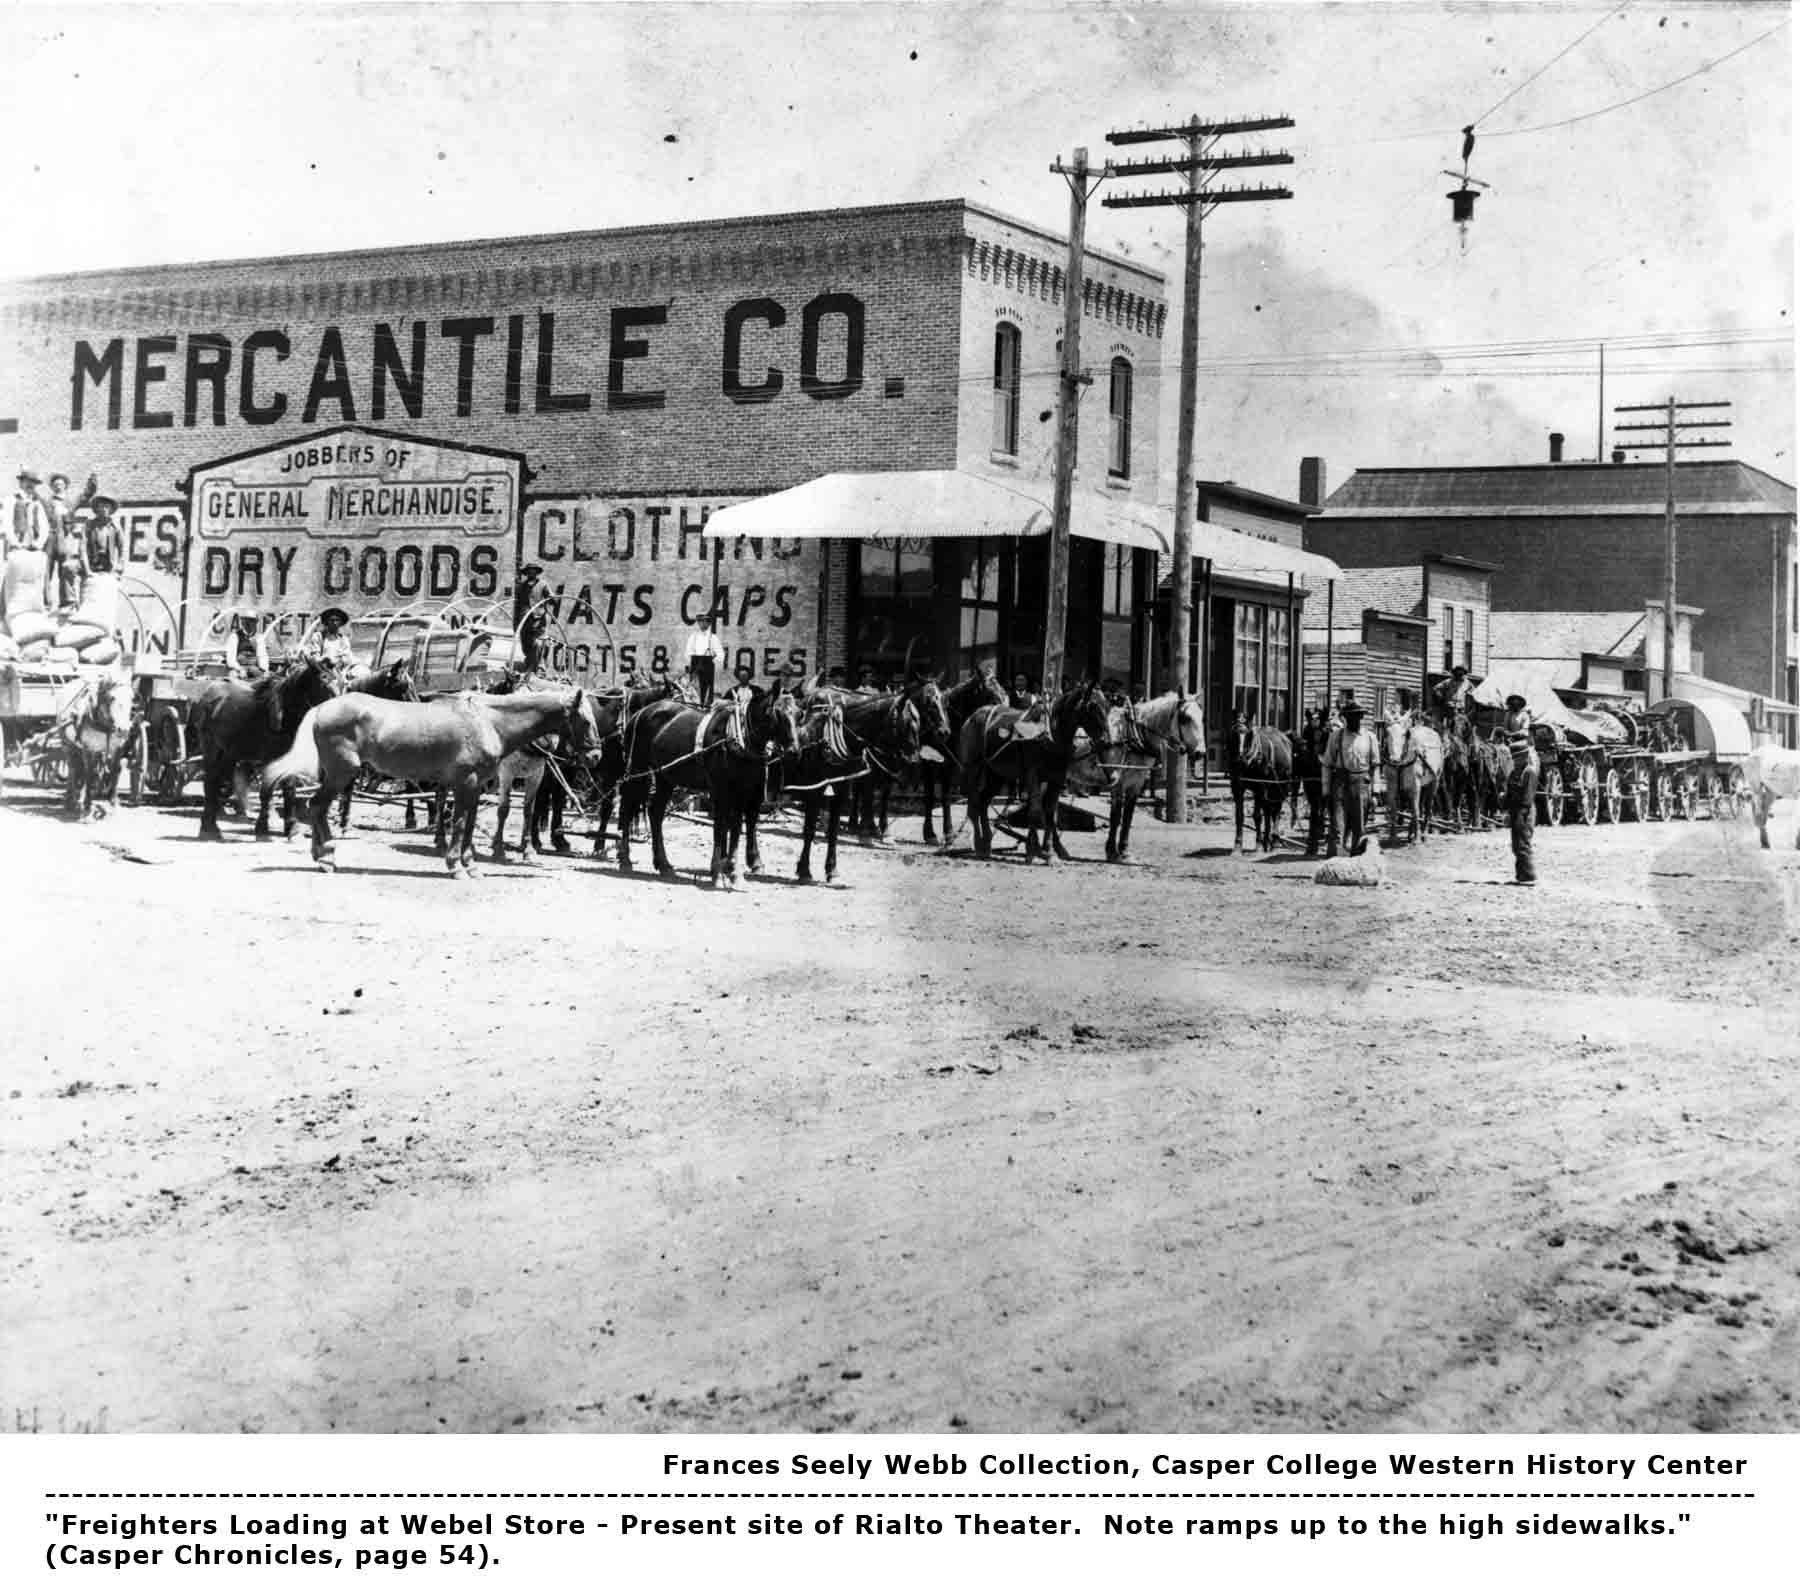 Old Town Casper | Downtown Development Authority of Casper, Wyoming